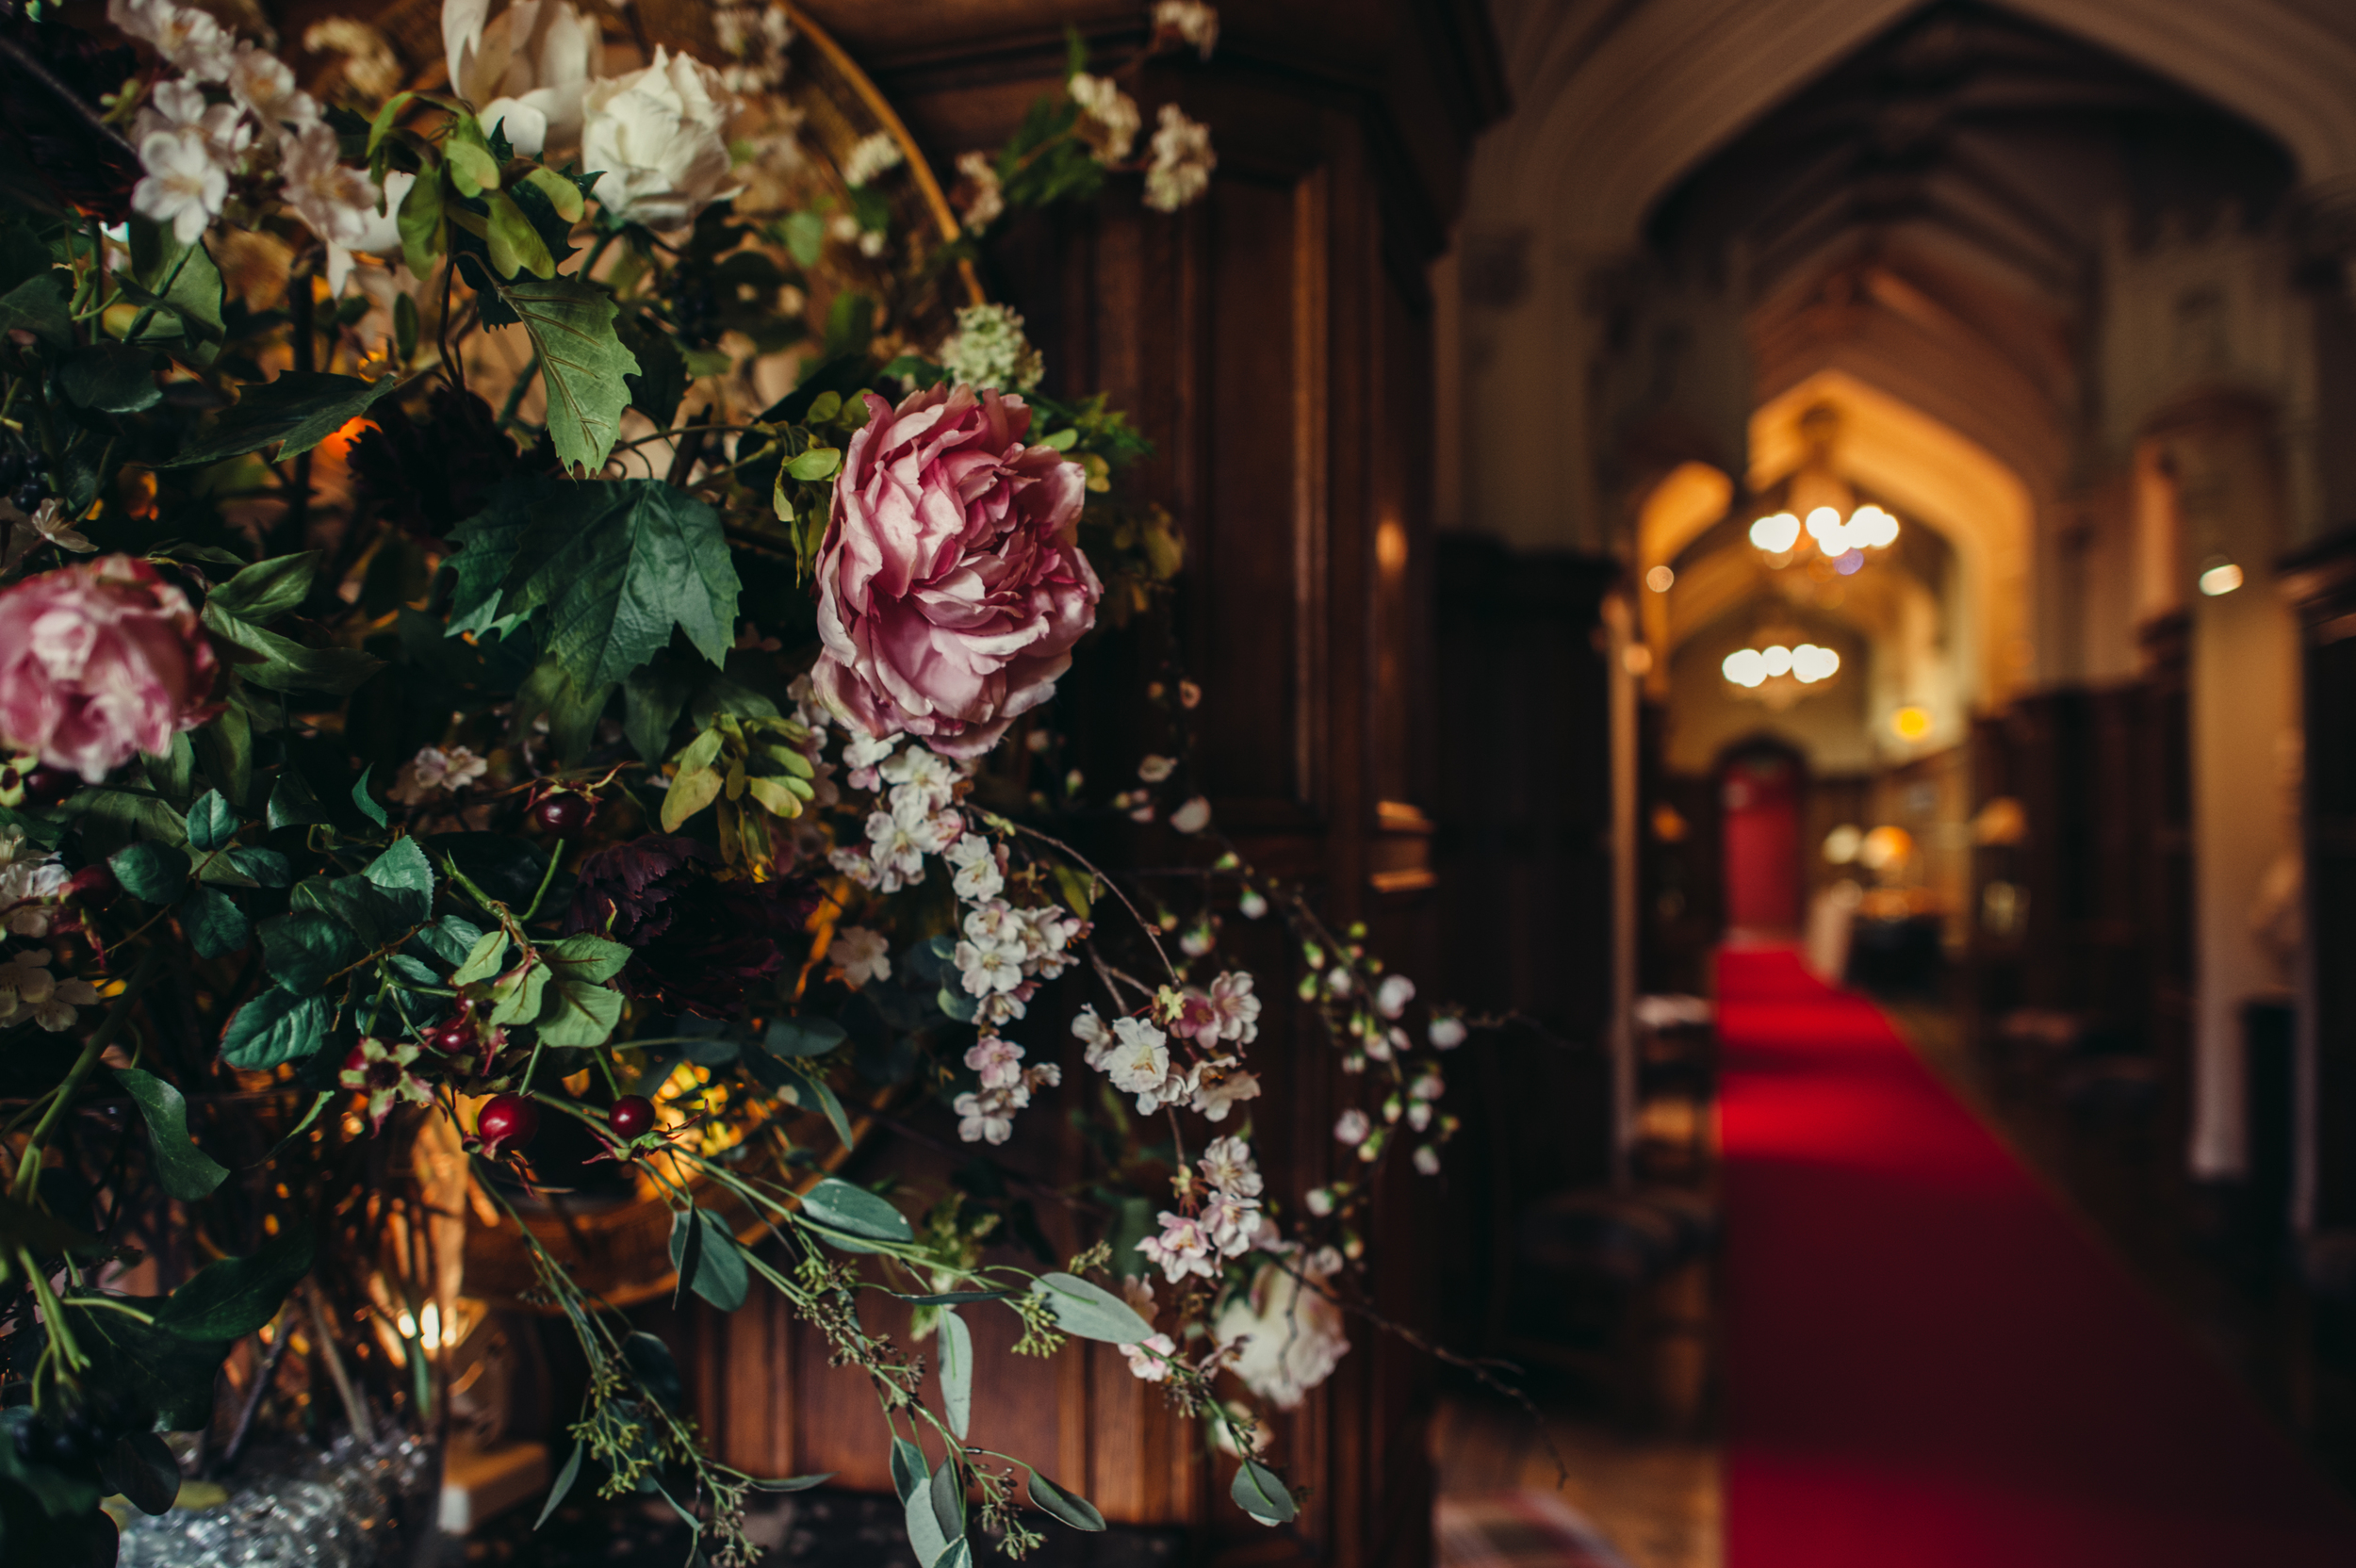 0016-lisa-devine-alternative-creative-wedding-photography-glasgow-edinburgh.JPG